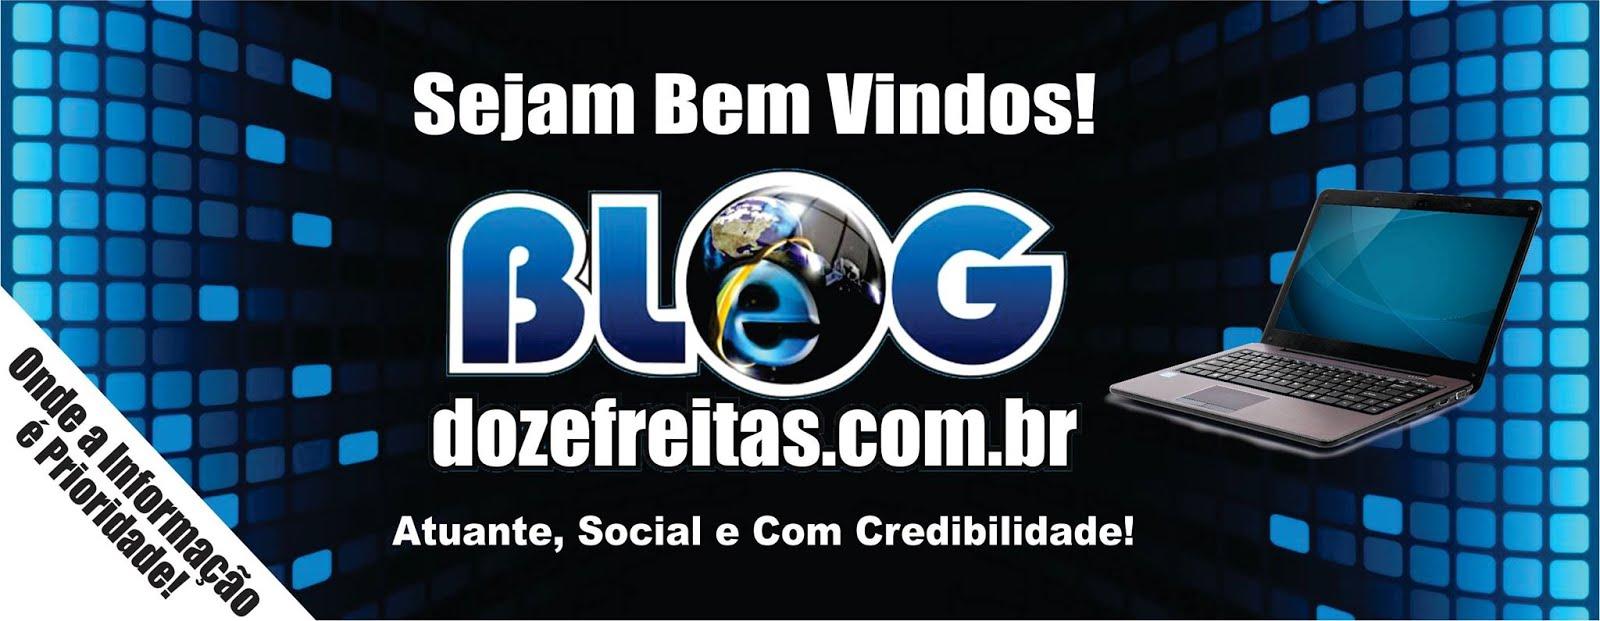 Blog's Parceiros